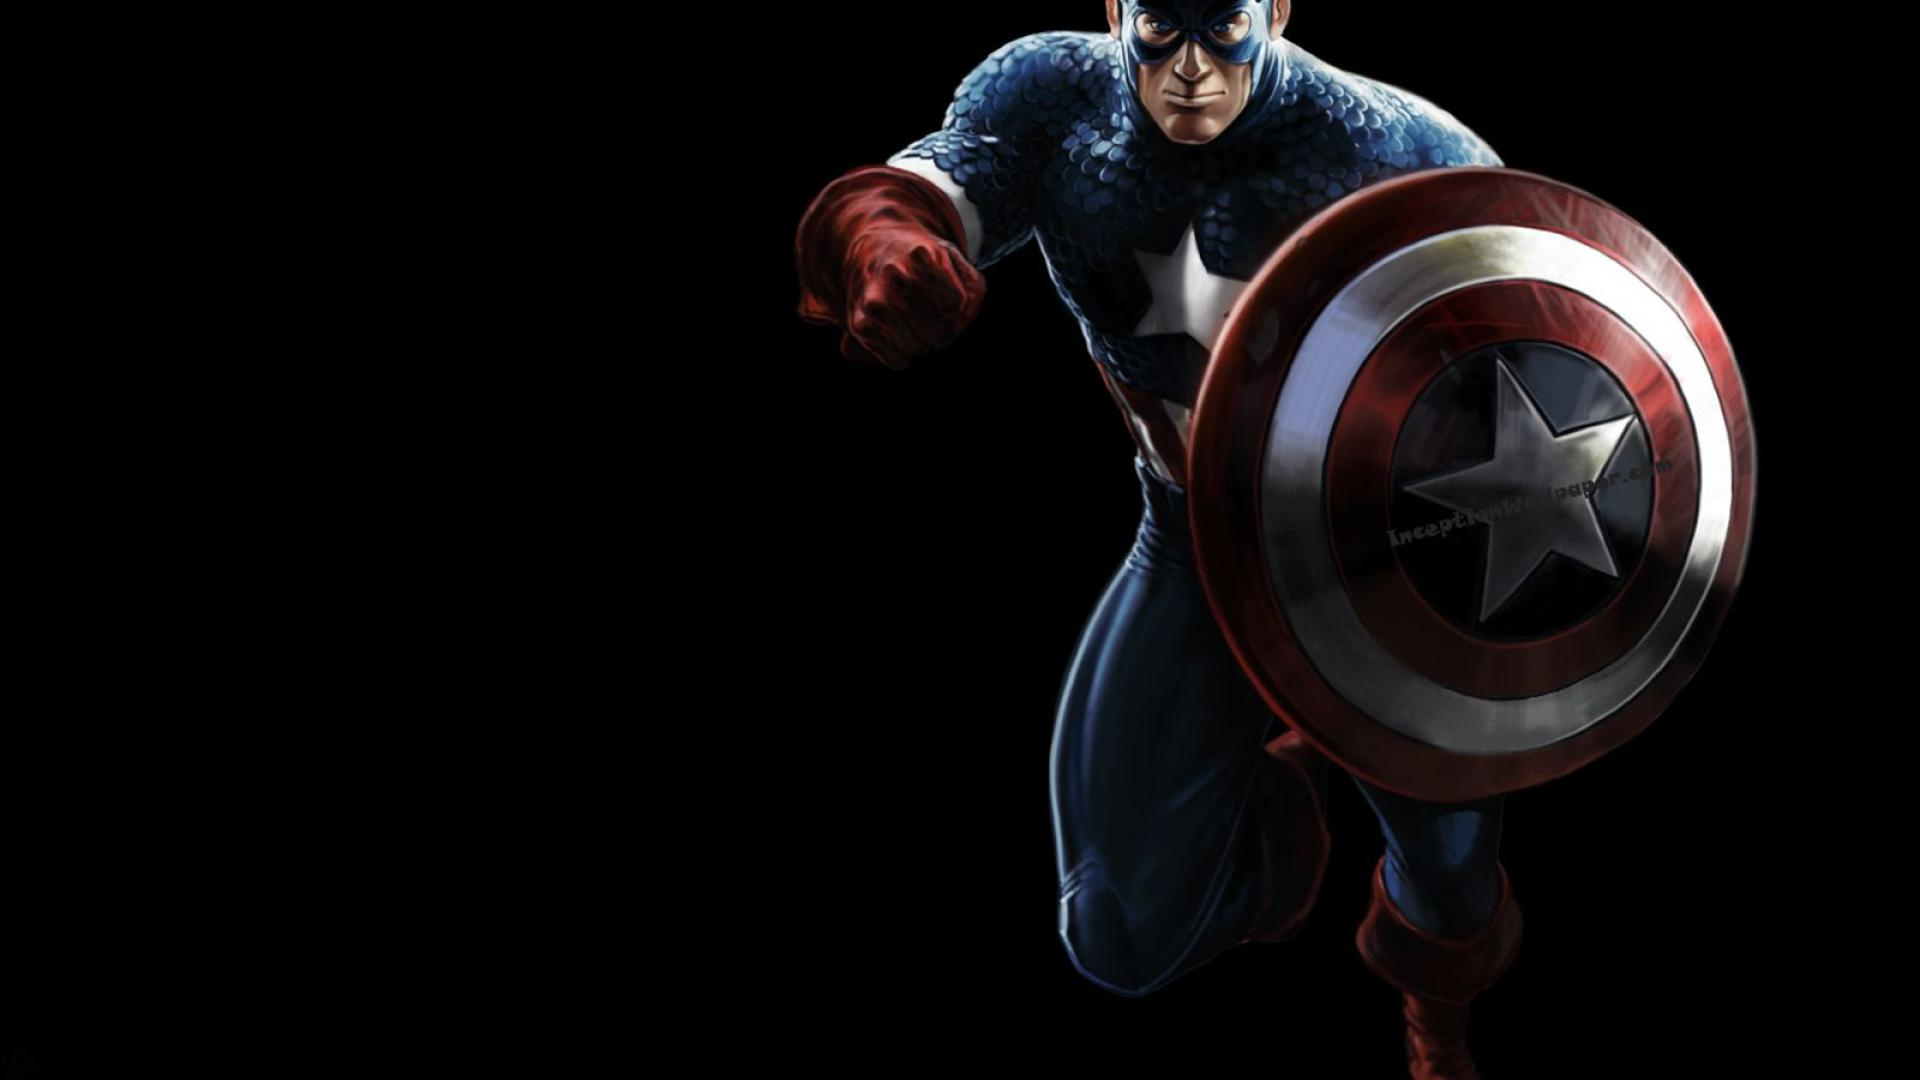 Captain America 04 1080x1920 Wallpaper HDTV Desktop Wallpaper HD 1920x1080